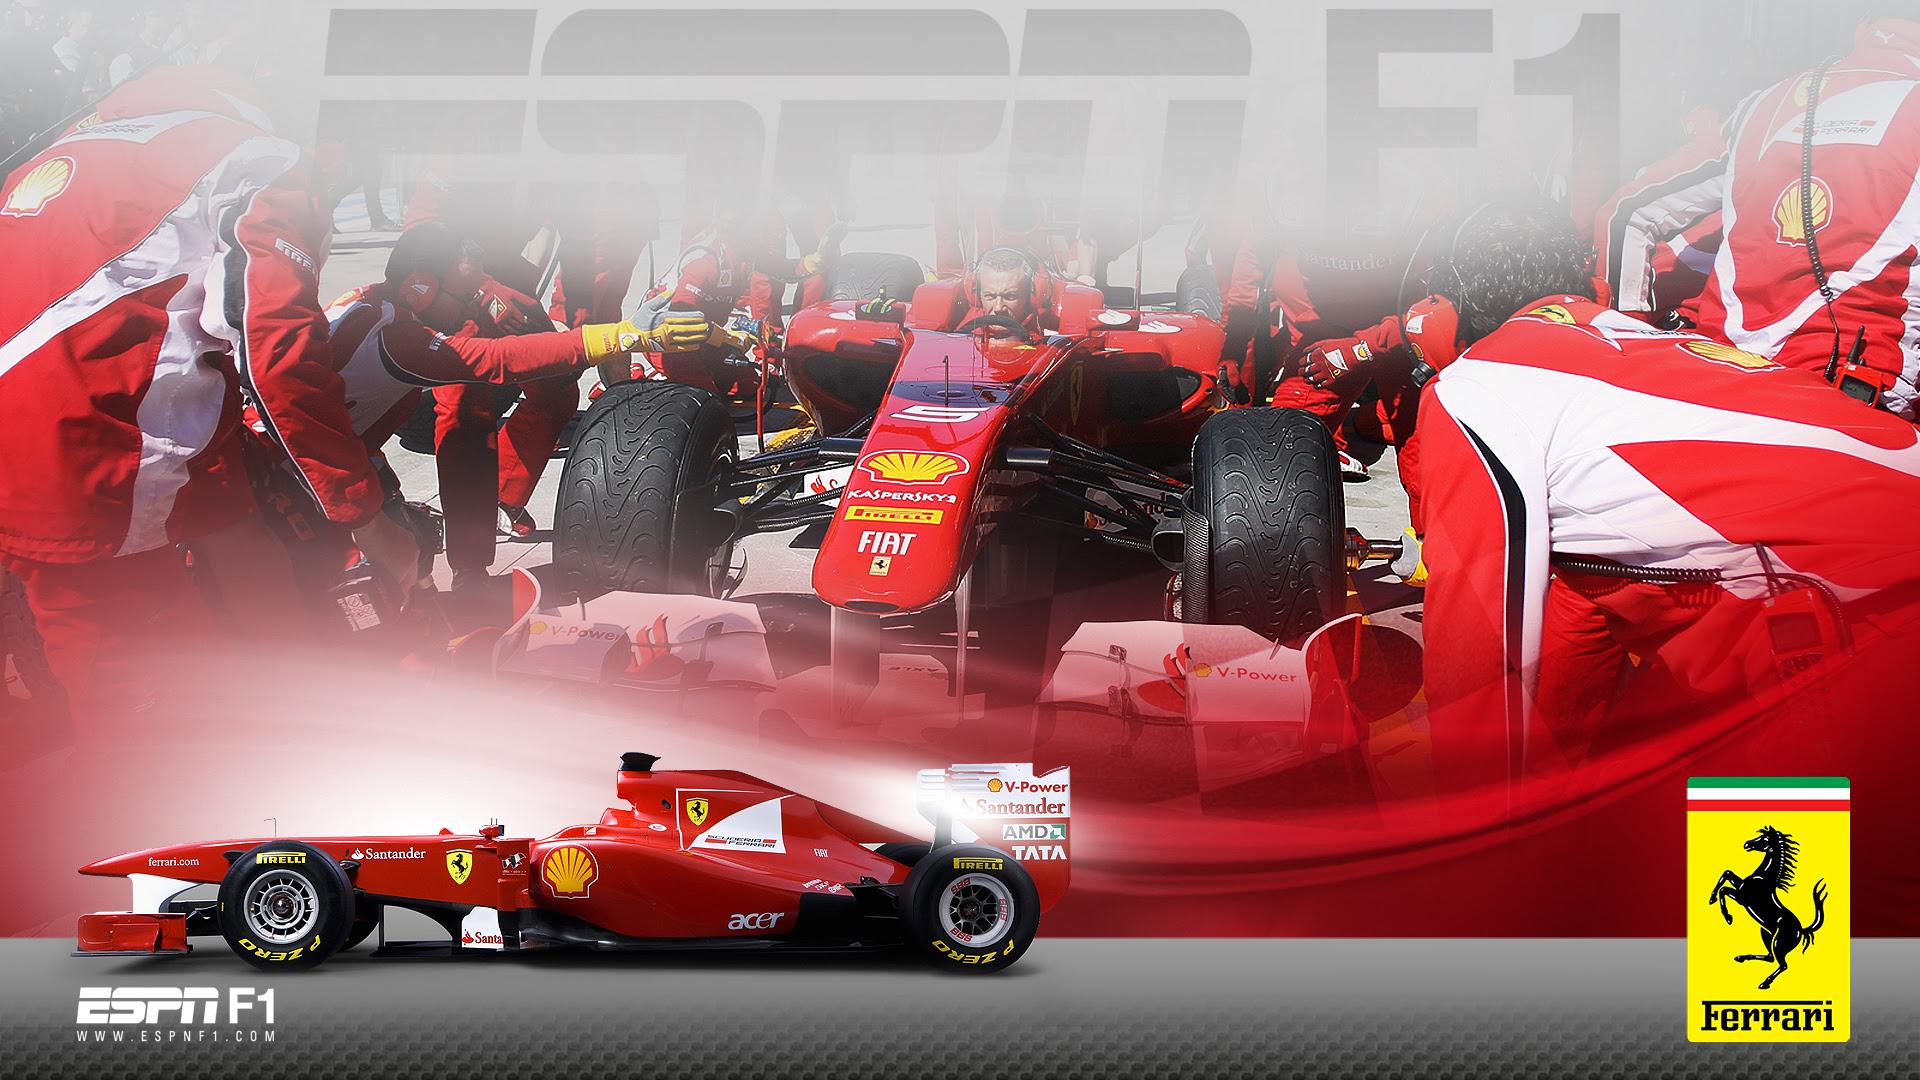 Ferrari Formula 1 Wallpapers Hd